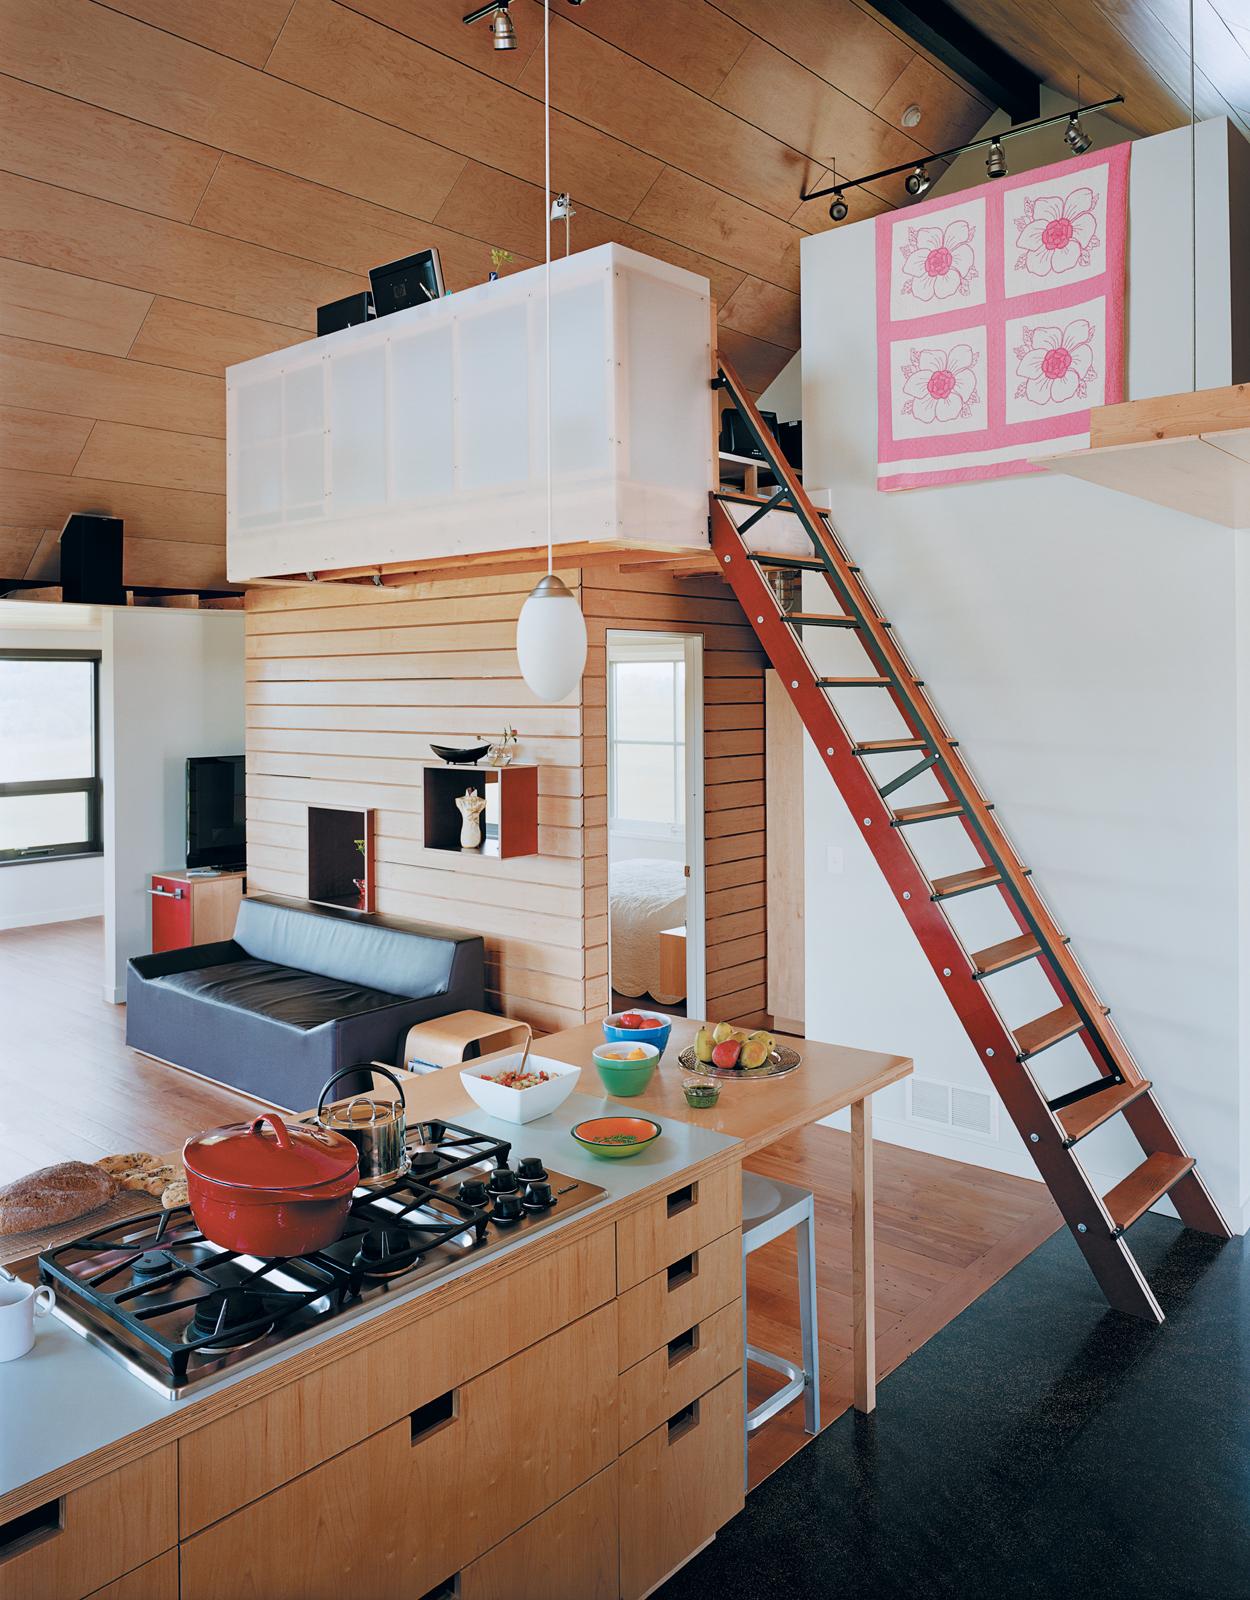 yum yum farm house kitchen storage space ladder